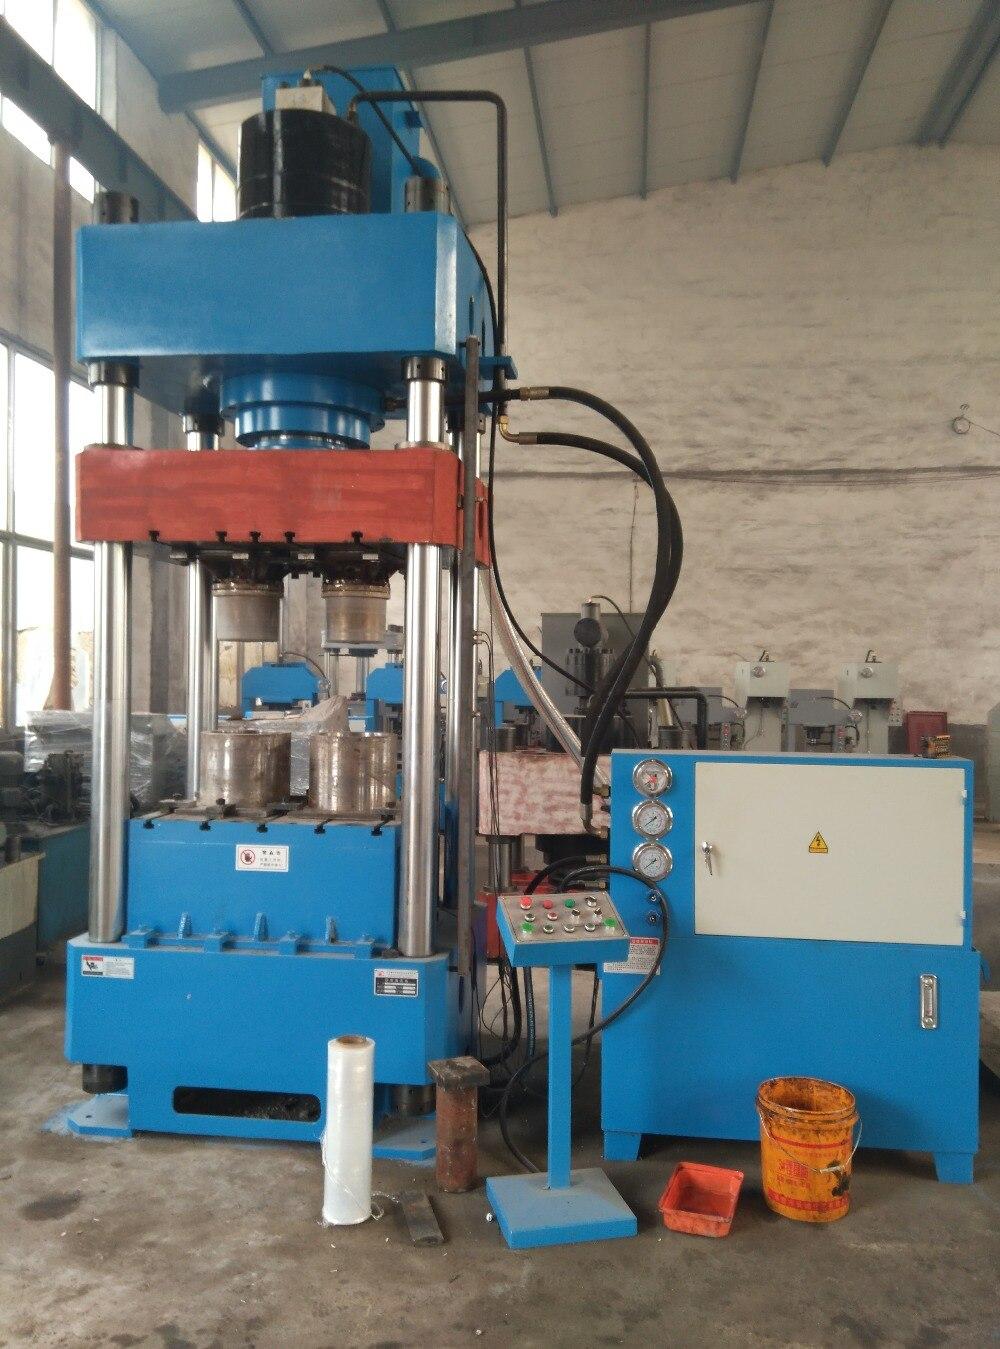 YTD32 315T electric hydraulic press machine shop machinery tools